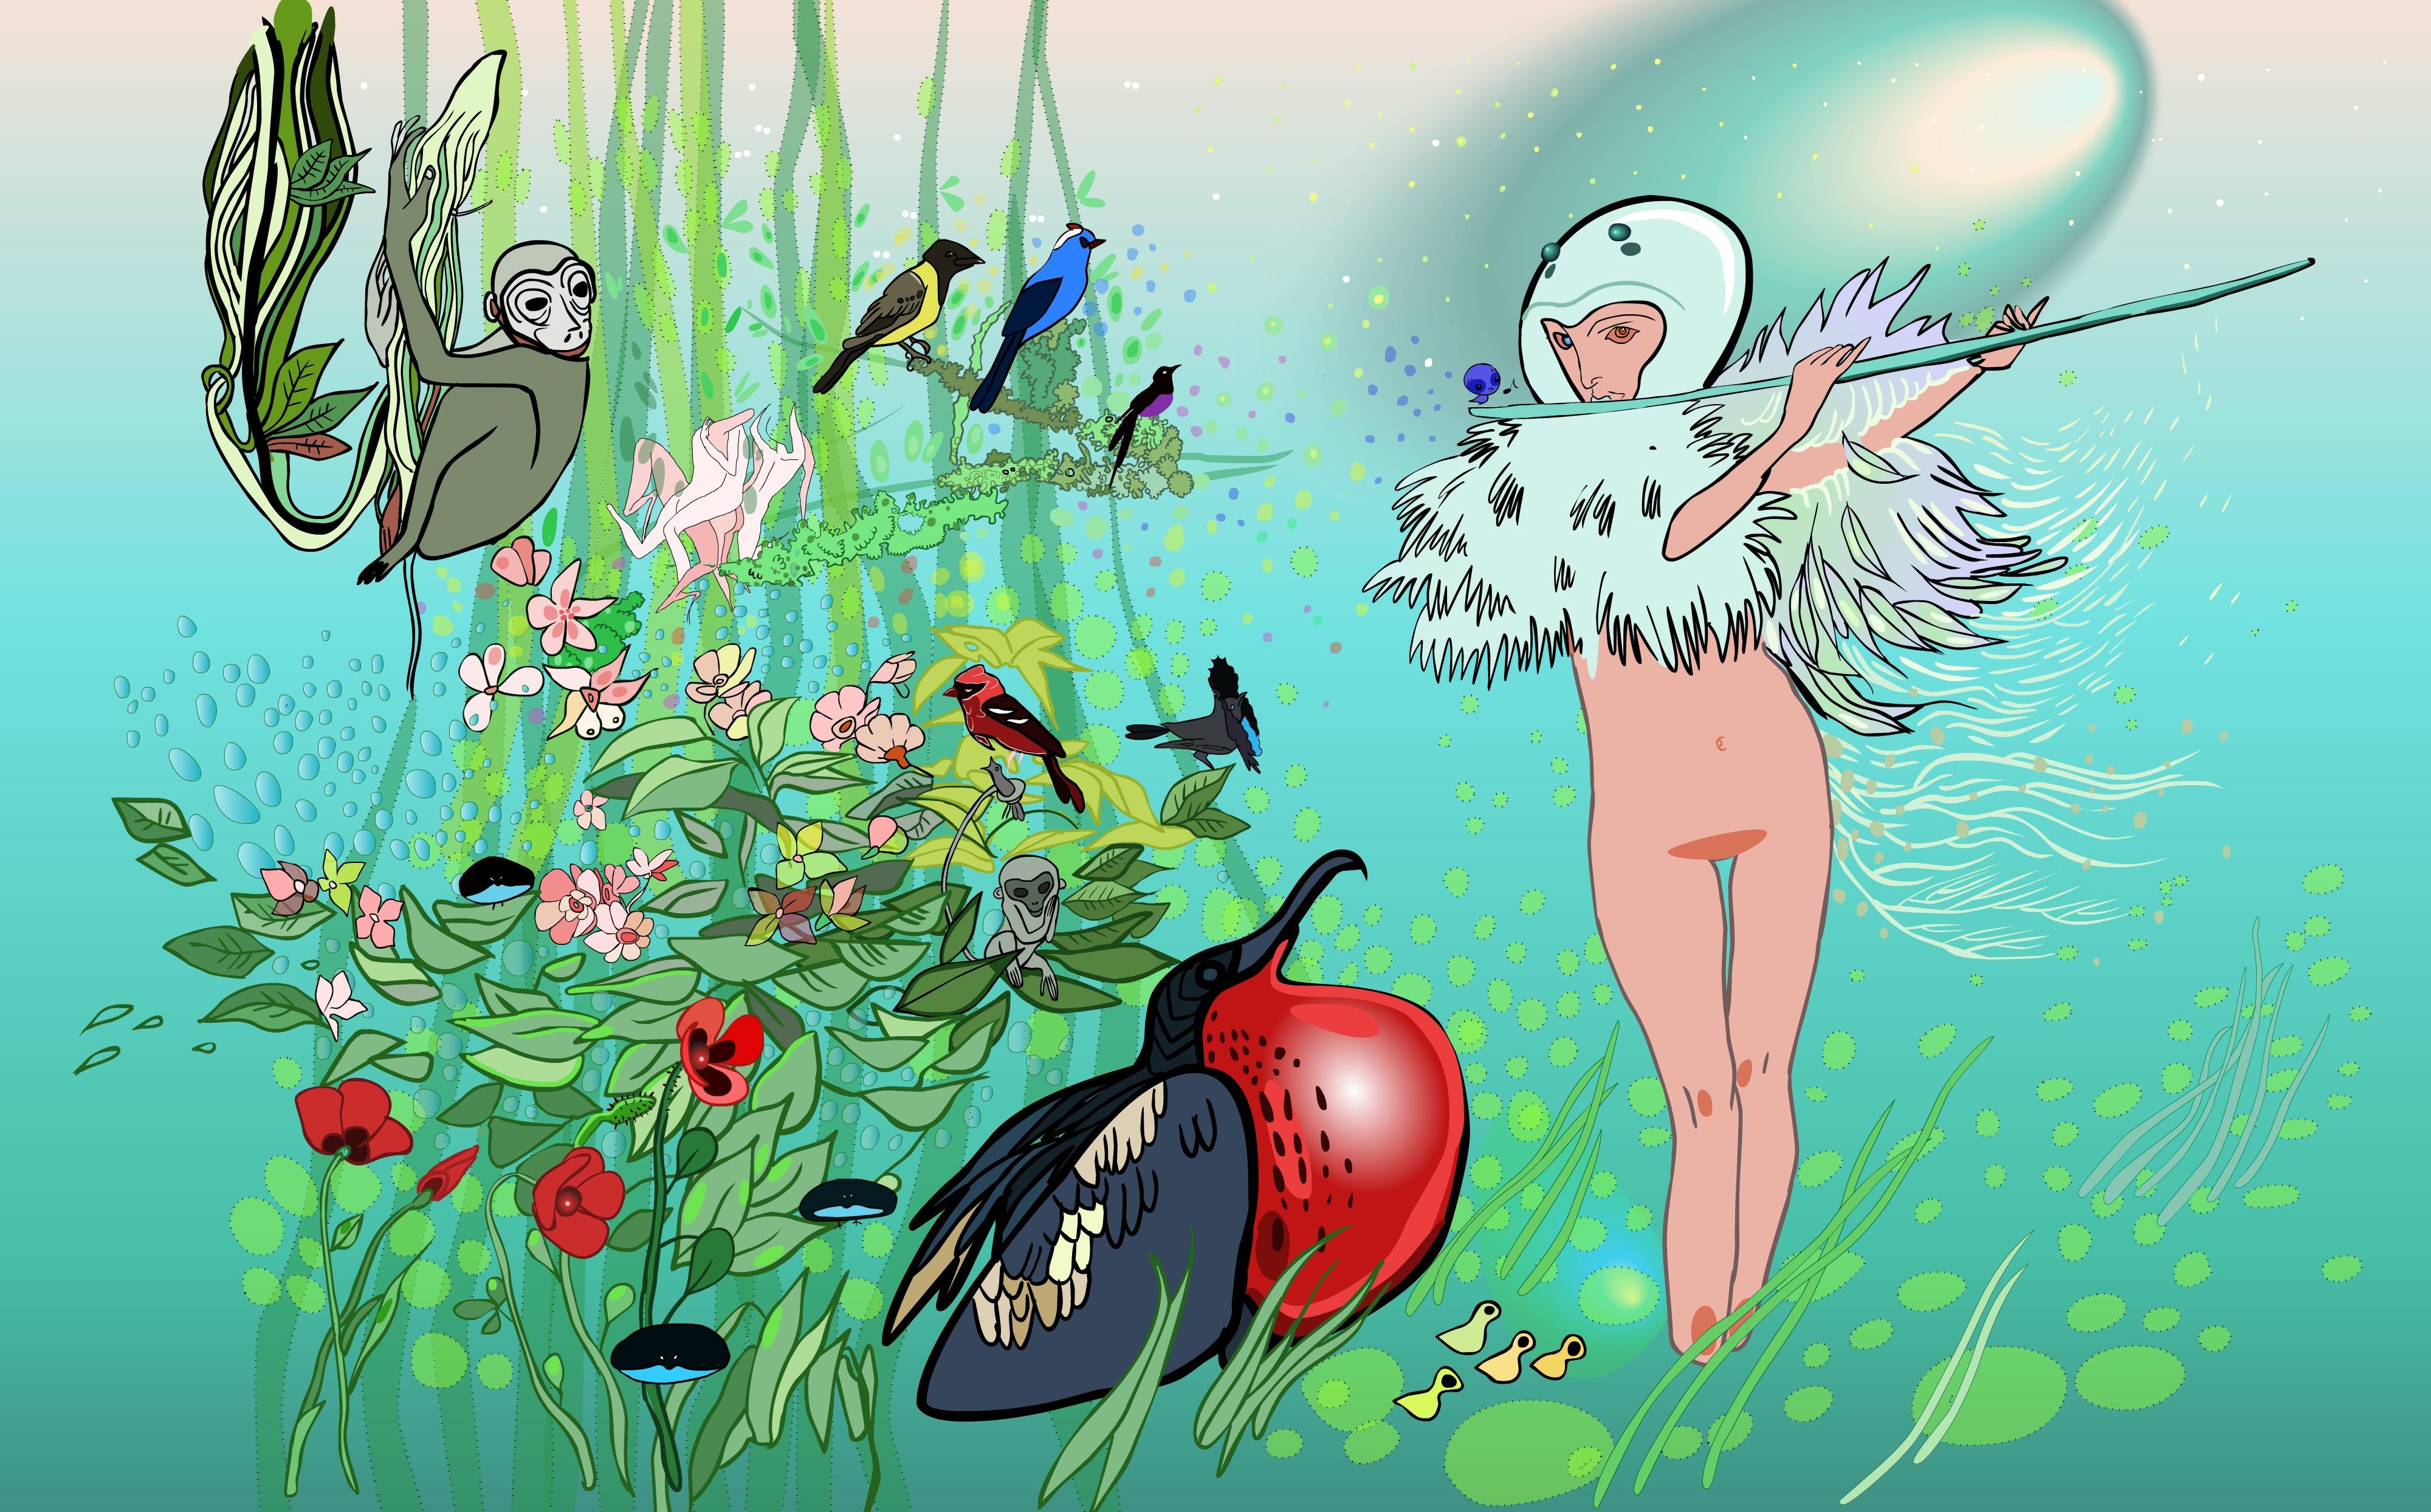 Pinar Yoldas - La sacre du printemps (źródło: materiał prasowy organizatora)